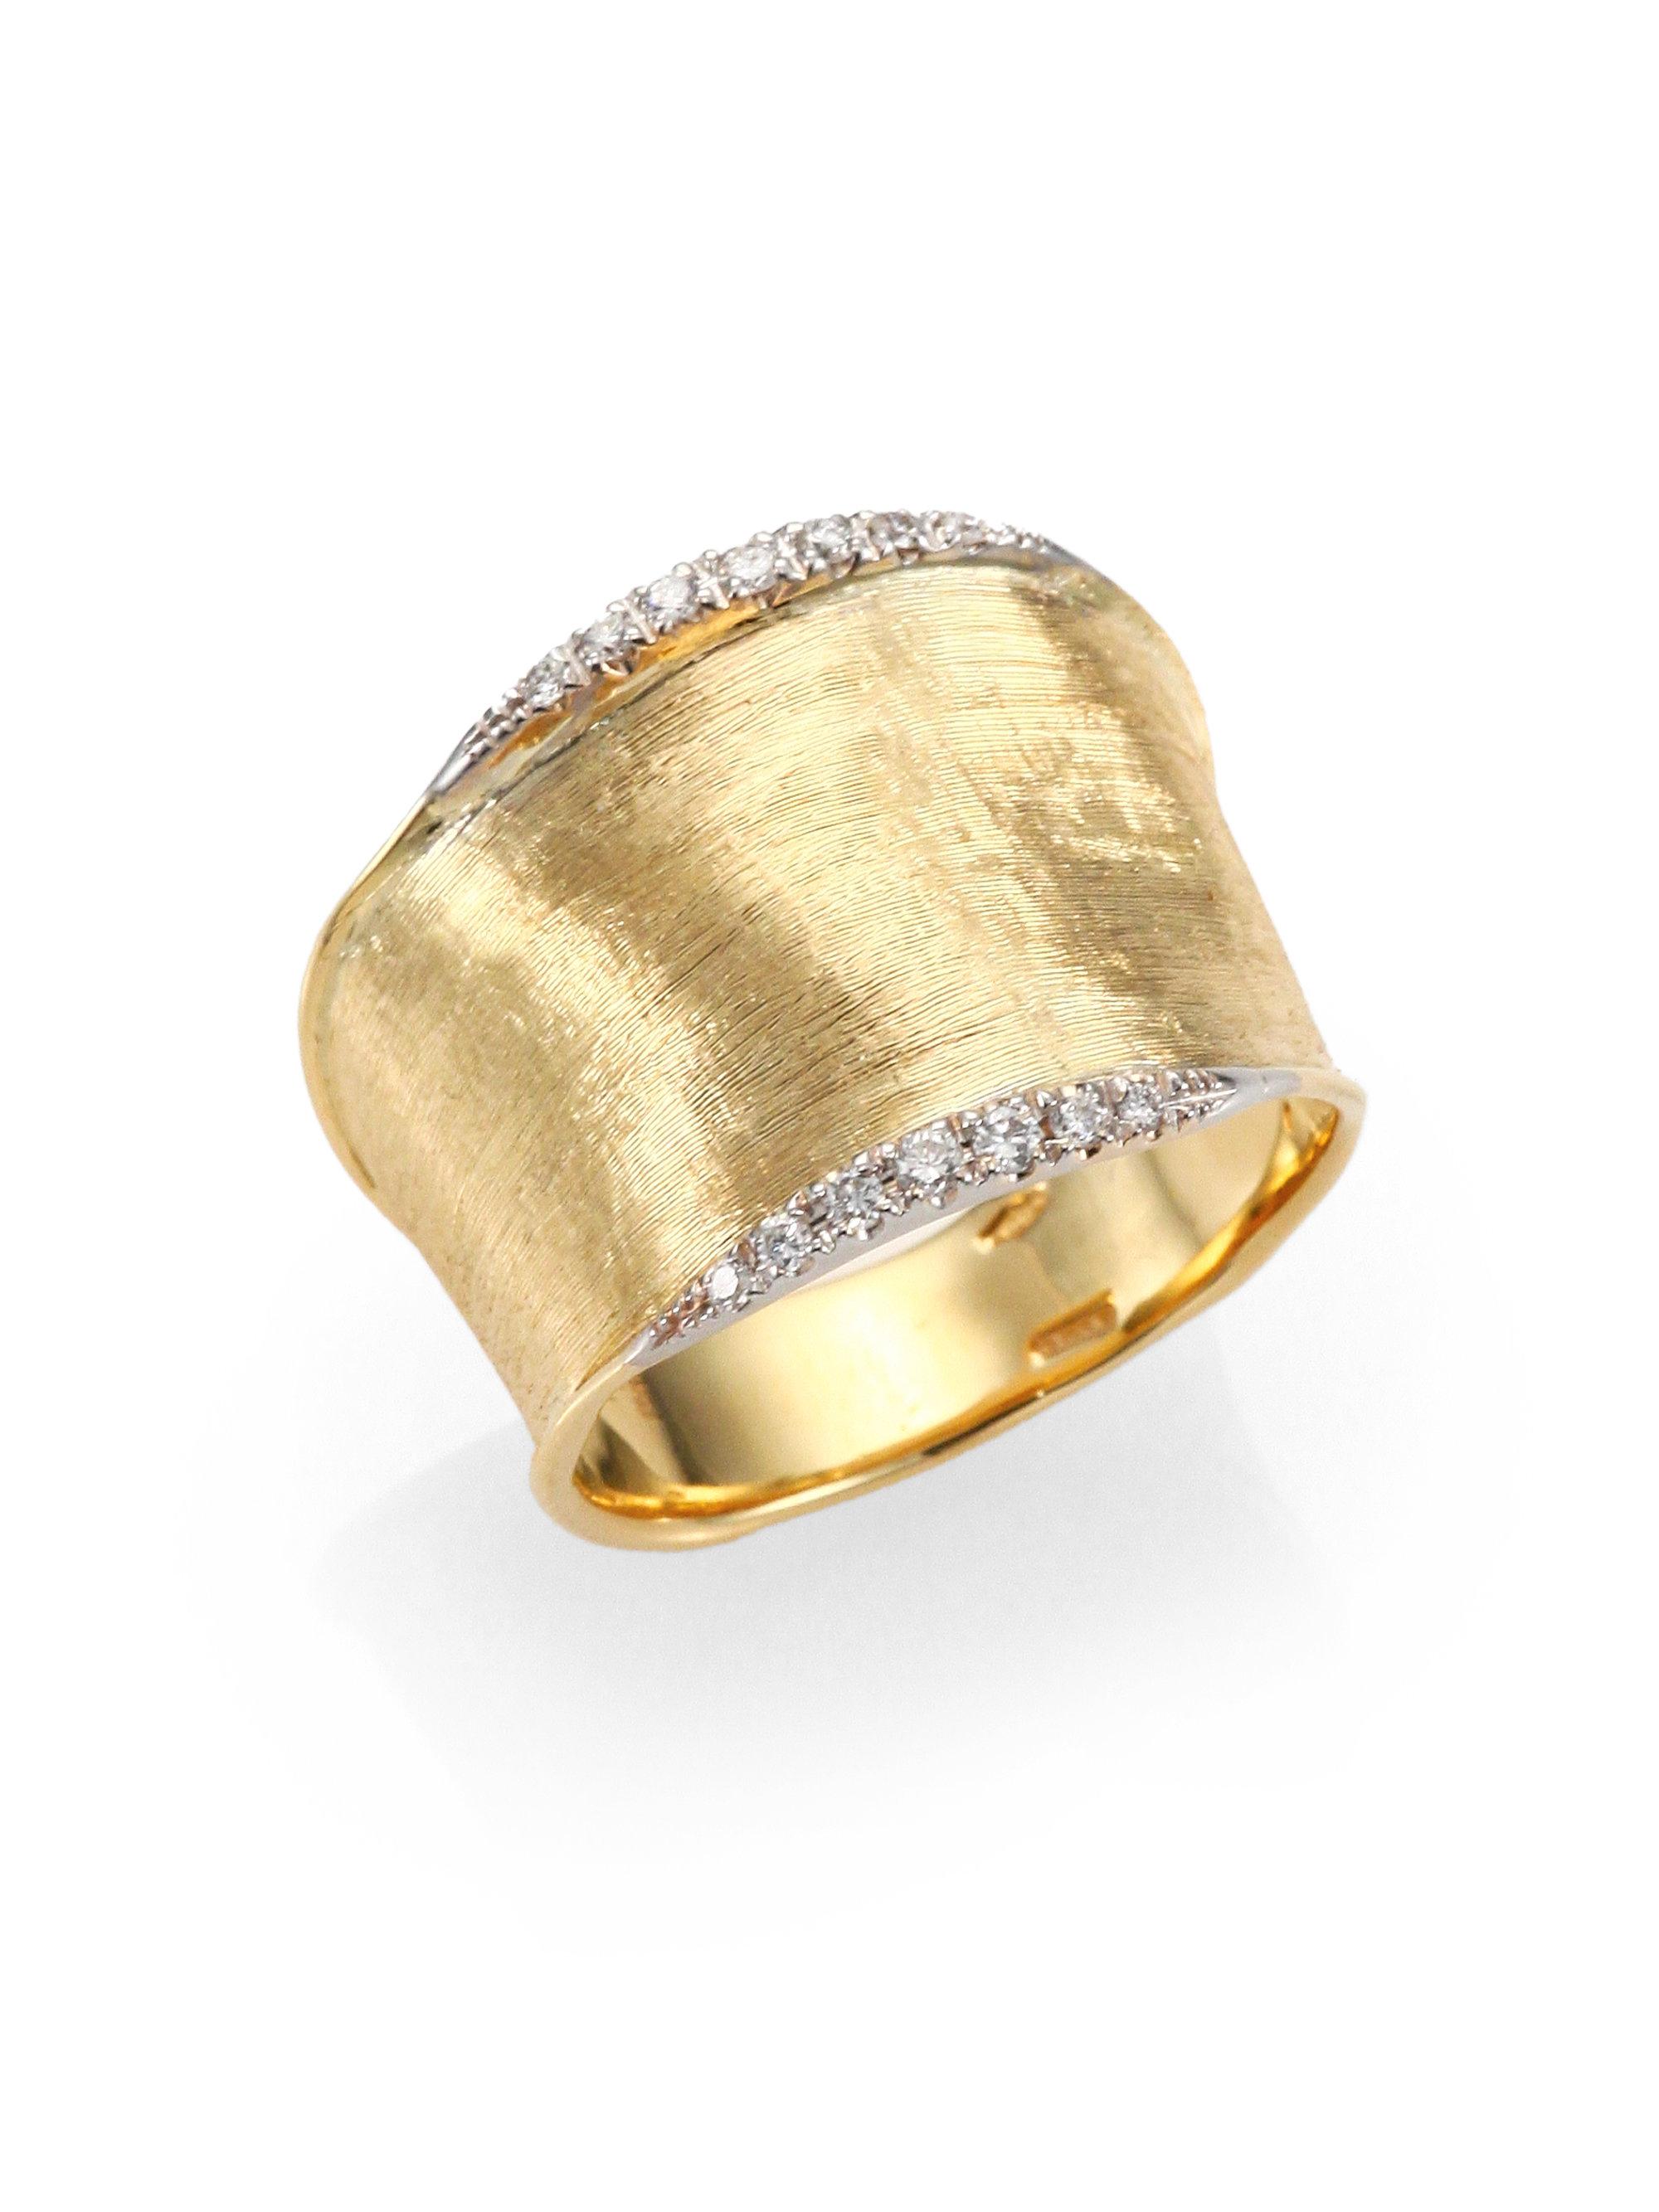 Marco Bicego Lunaria Diamond Amp 18k Yellow Gold Band Ring